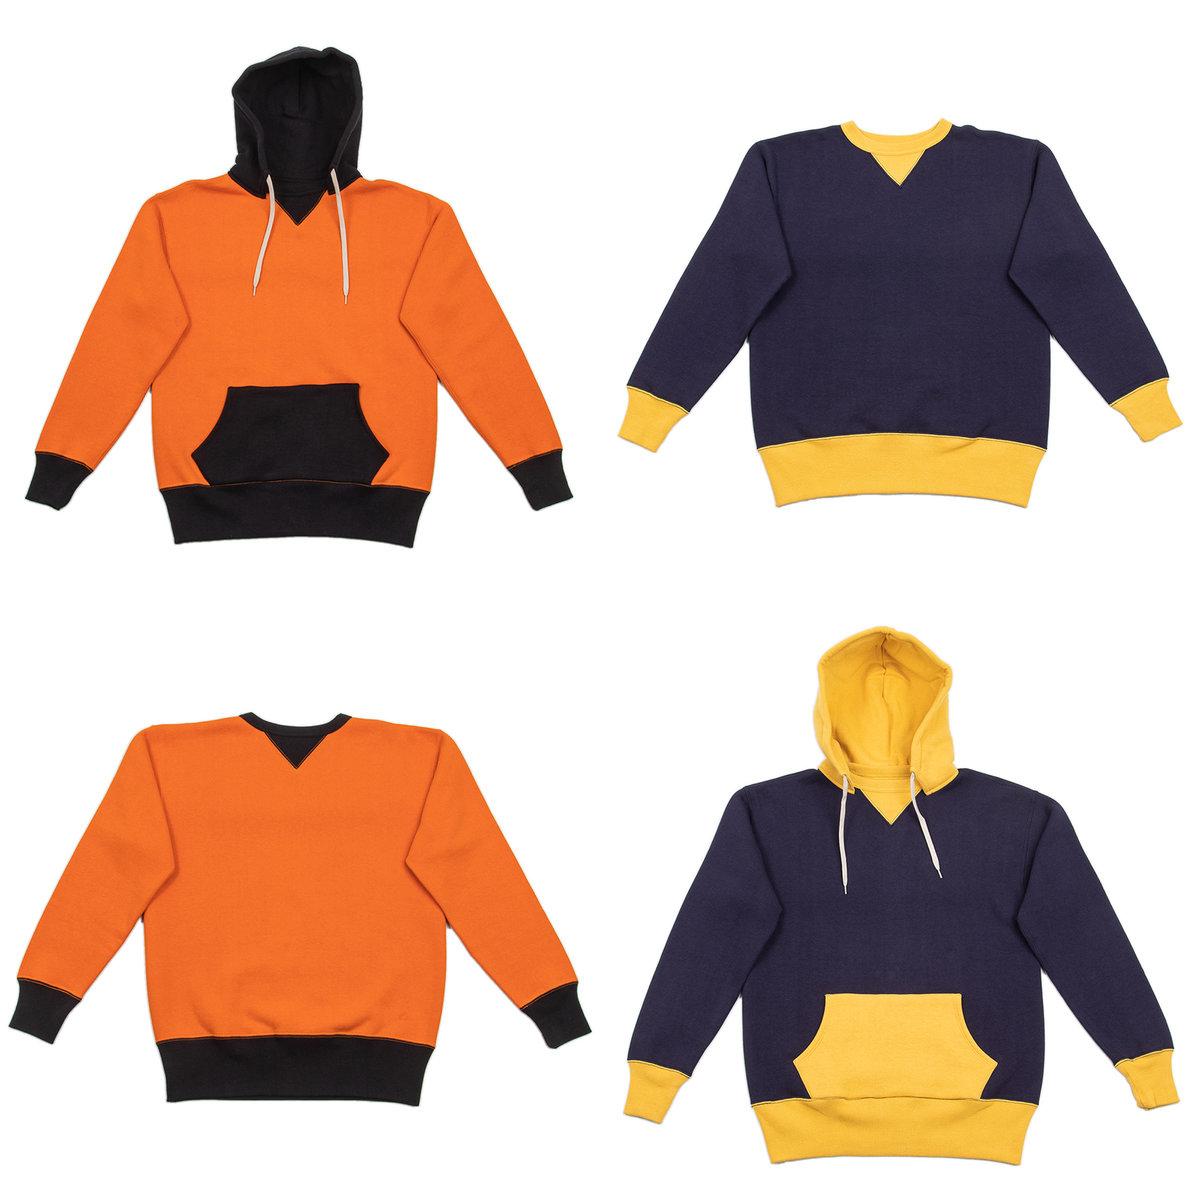 RMC - Two Tone Loopwheels -Navy-Yellow-Orange-Black--Grid-Flat-01.jpg